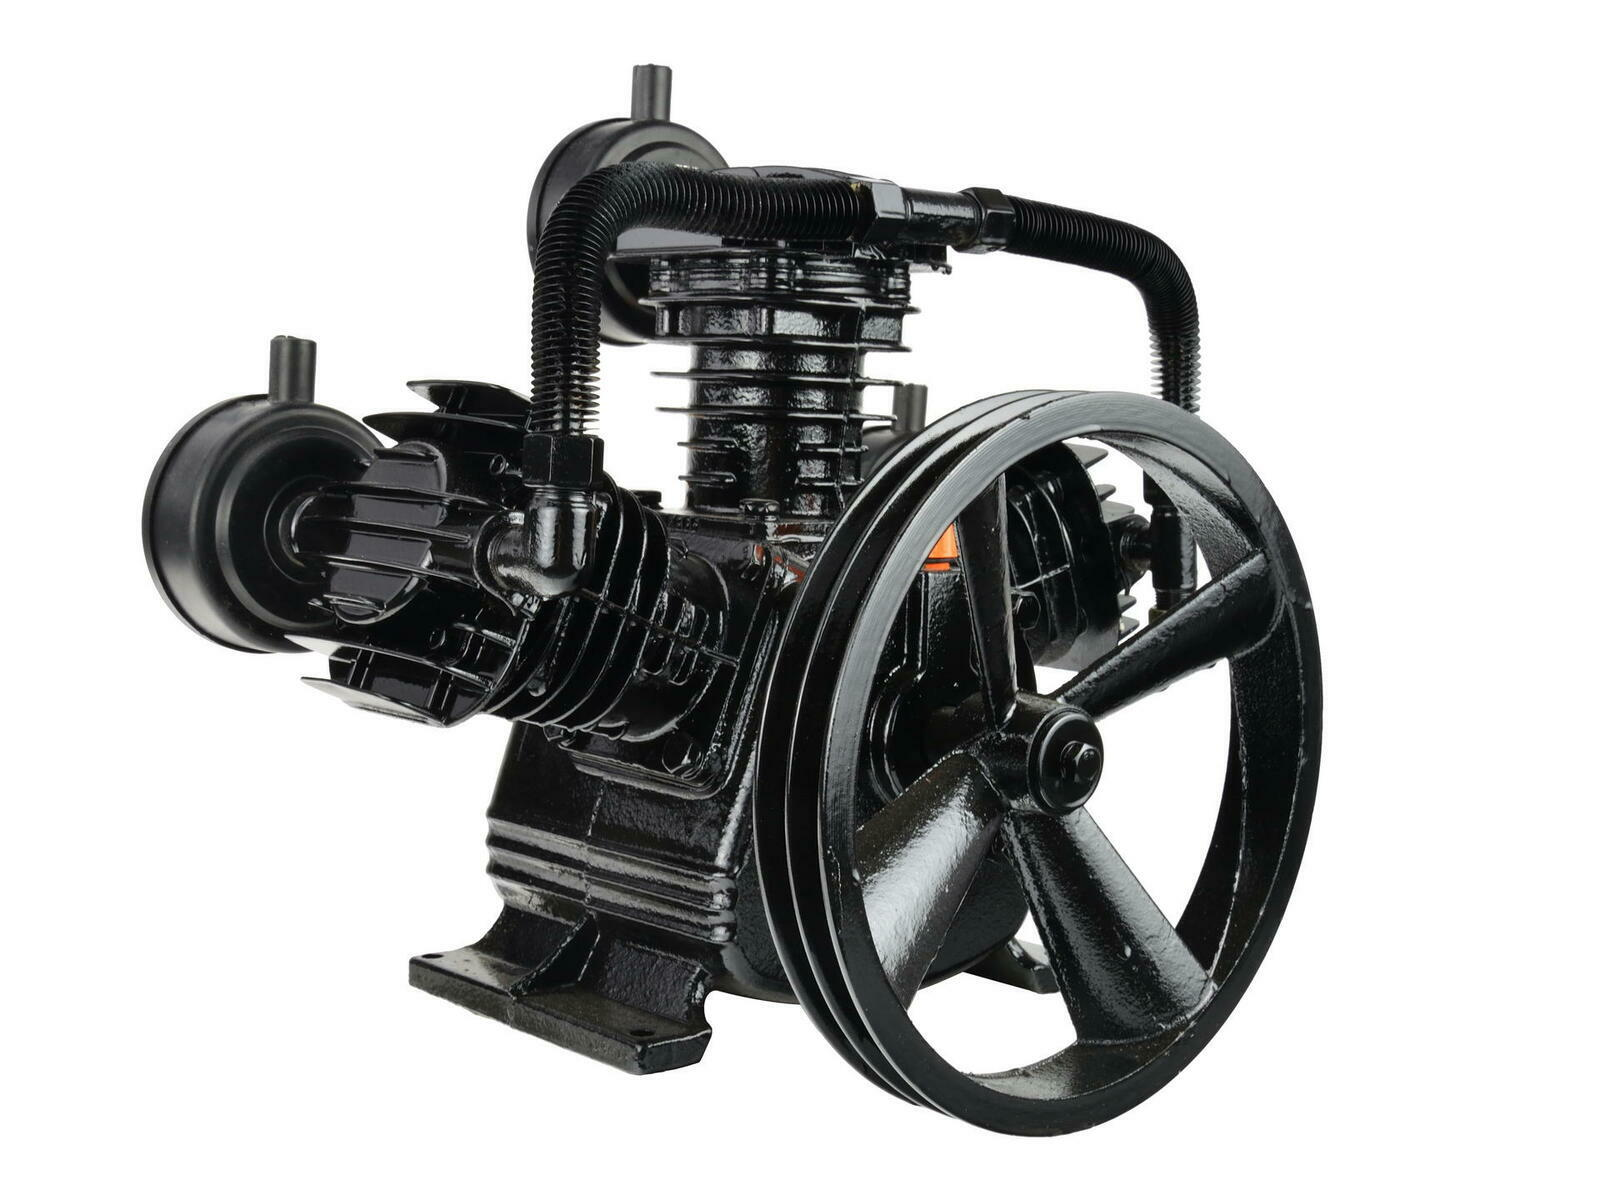 Kompresor - pumpa, pro vzduchový olejový kompresor, 3válcový